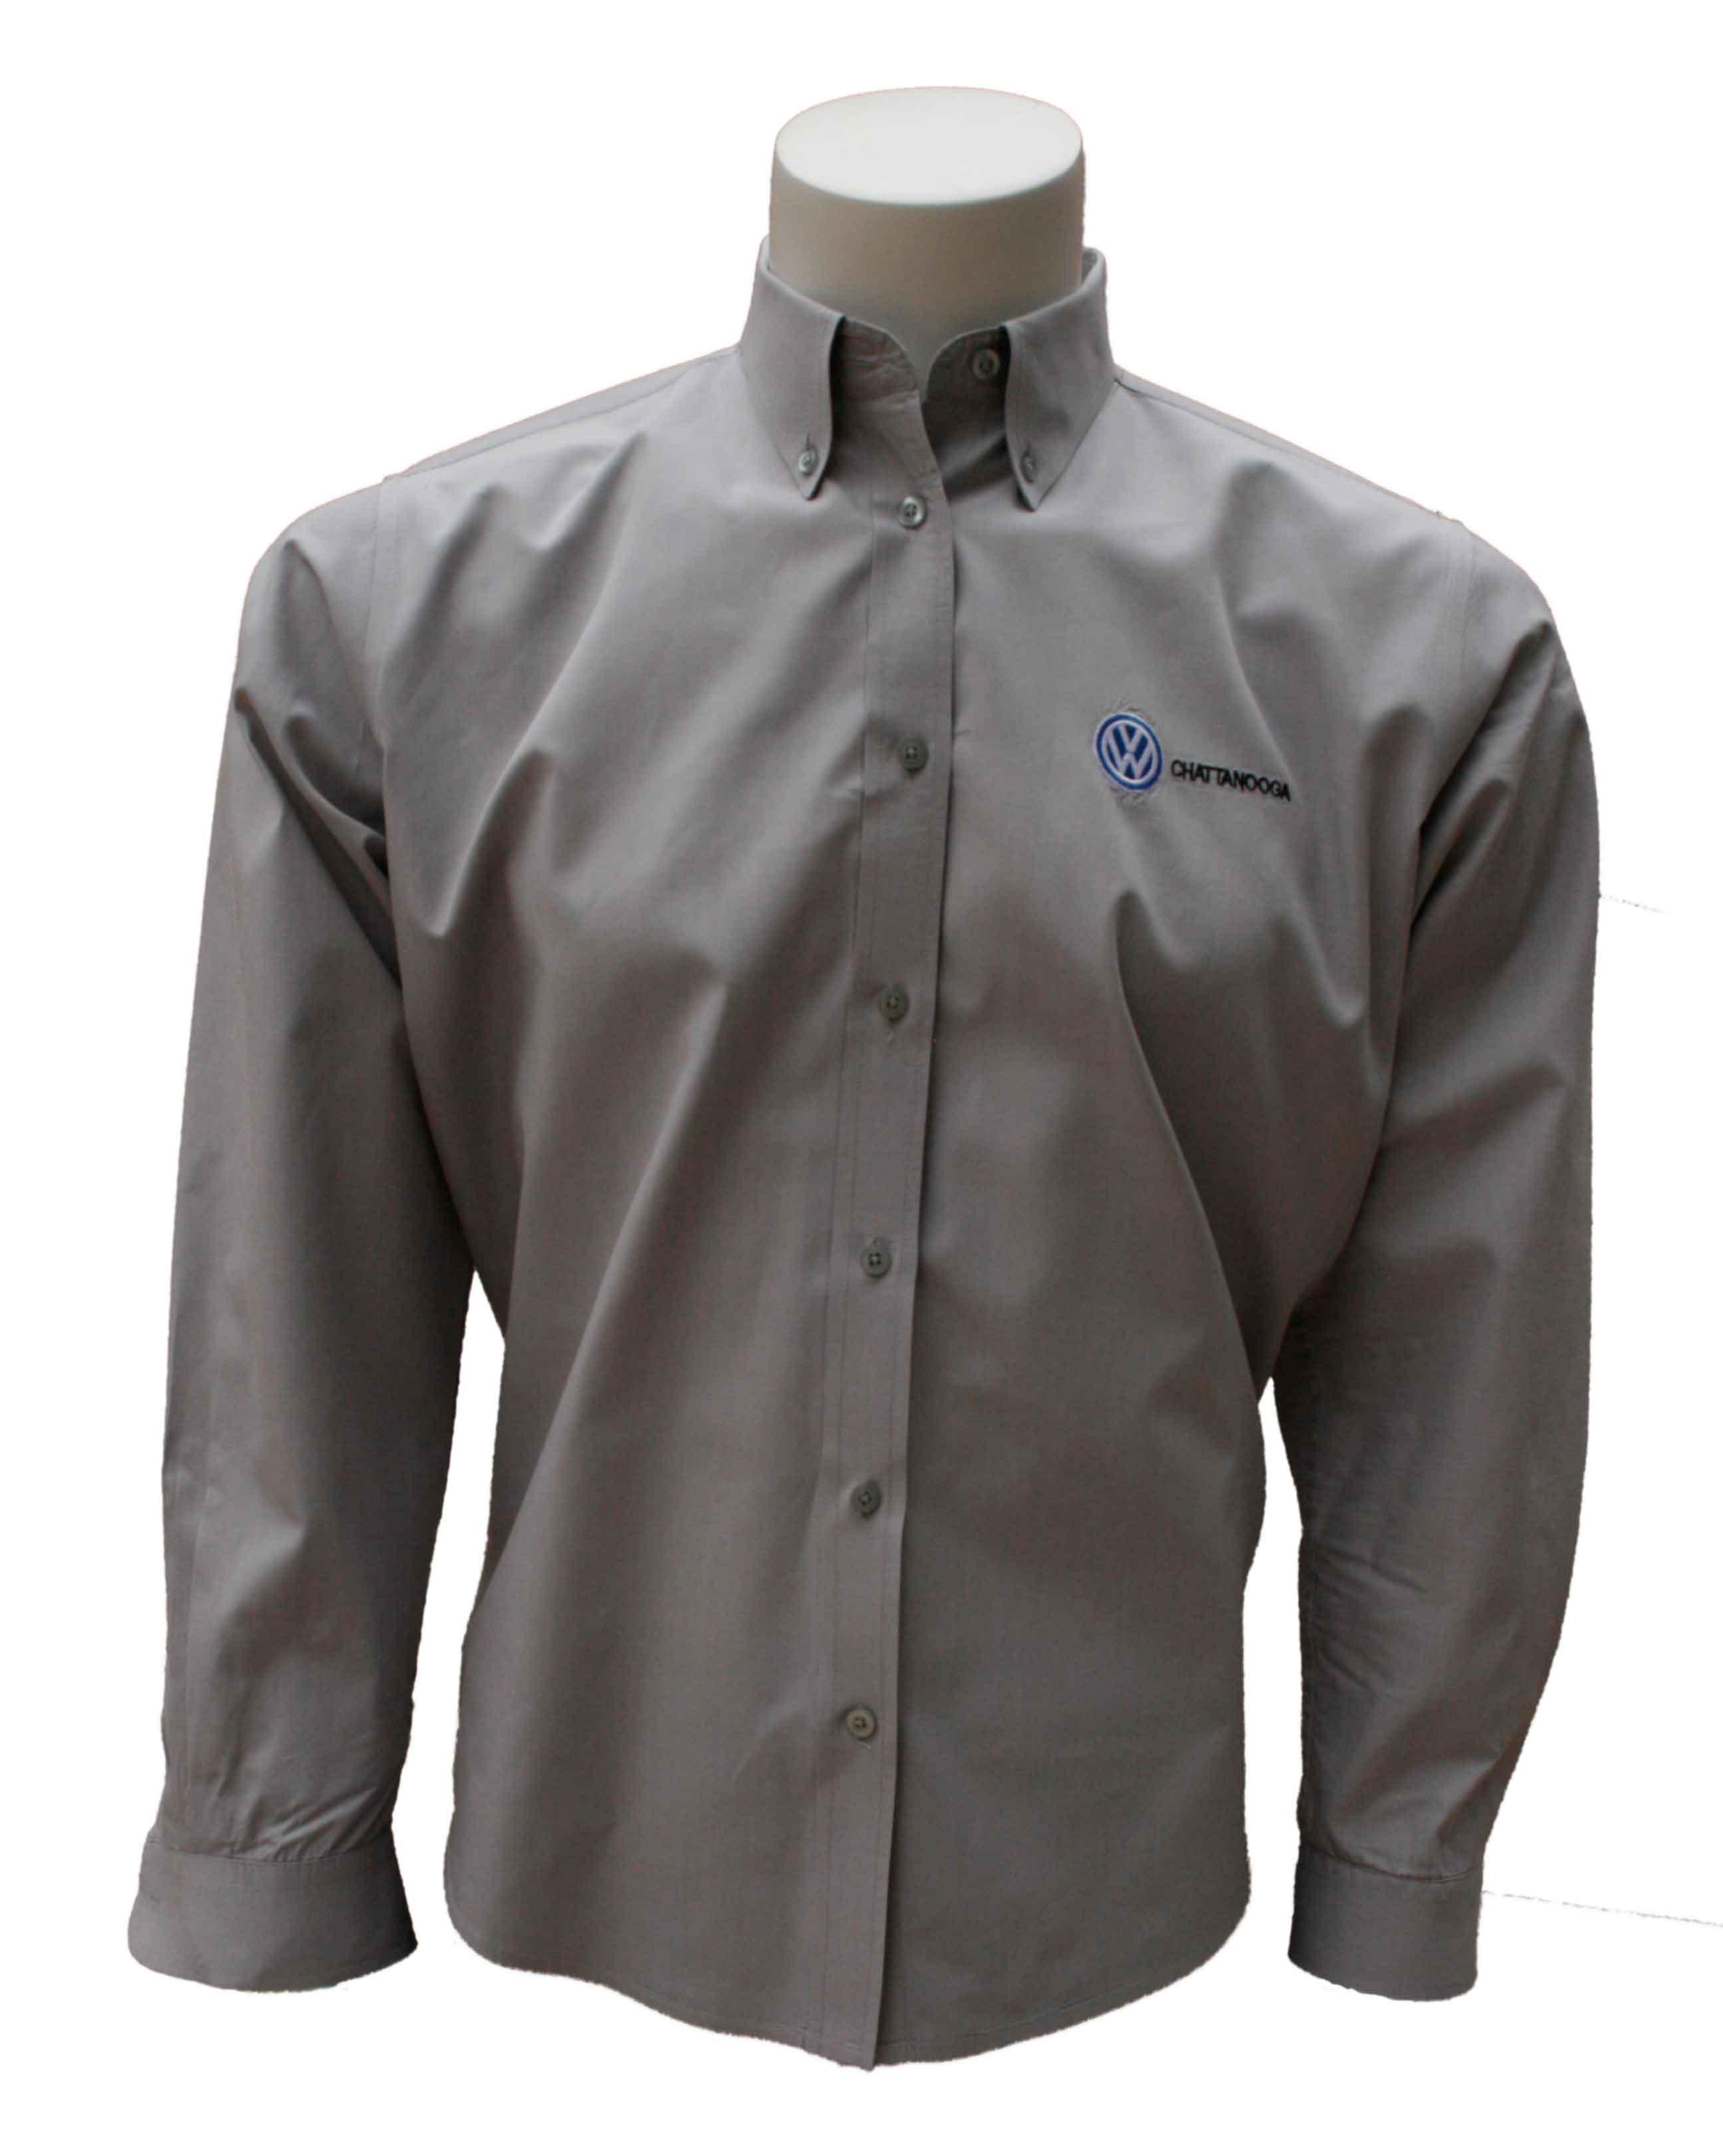 Men 39 s long sleeve shirt teamwear gray zepter sports usa for Grey long sleeve shirts